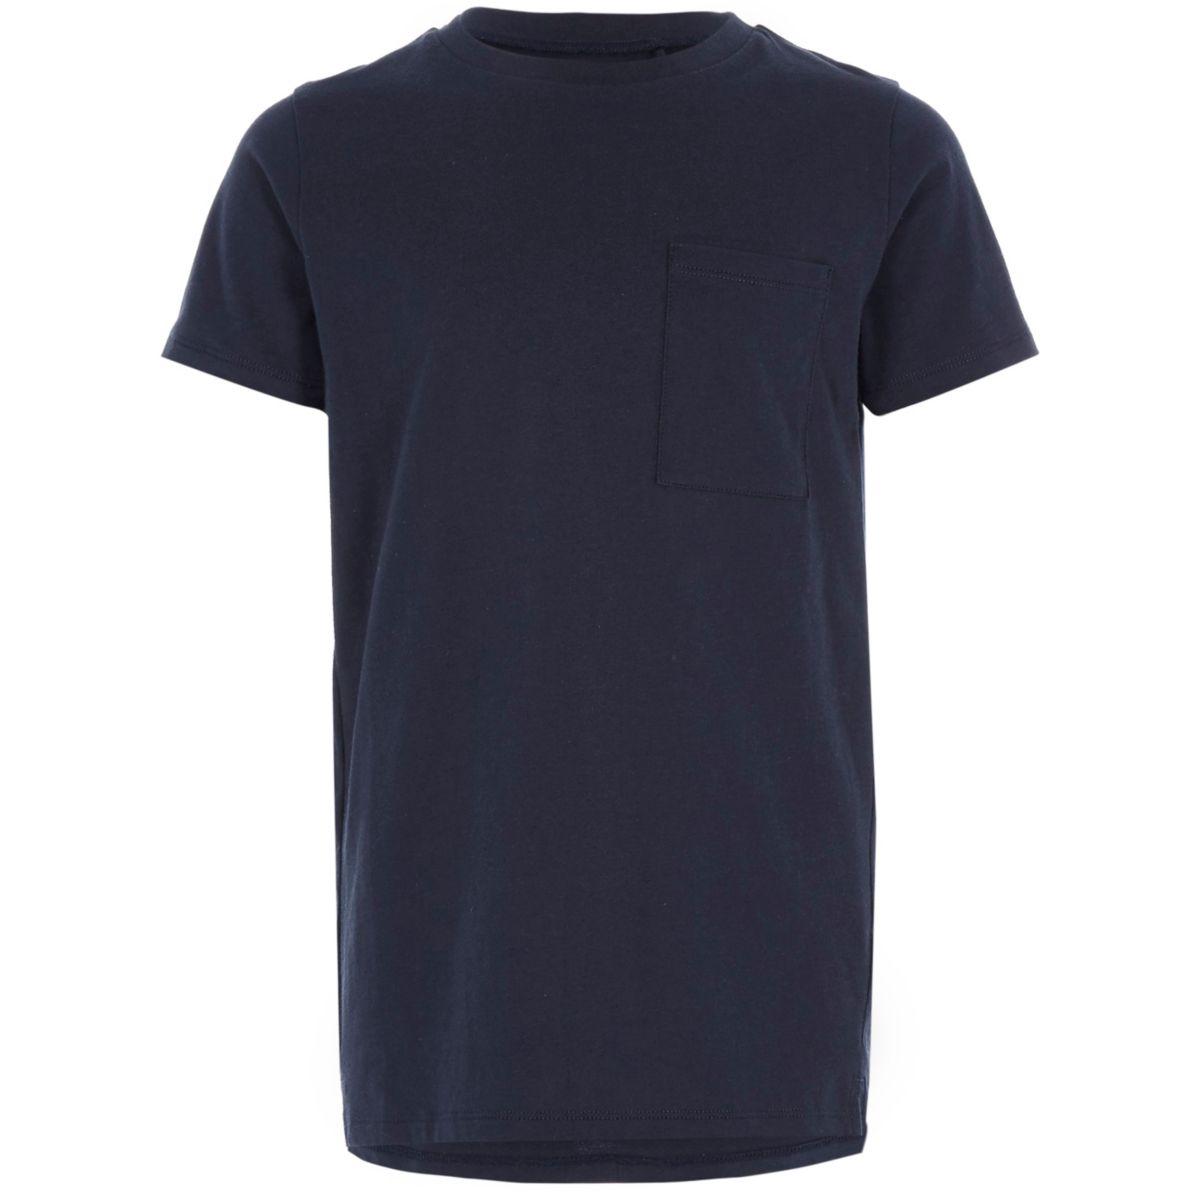 Boys navy pocket T-shirt